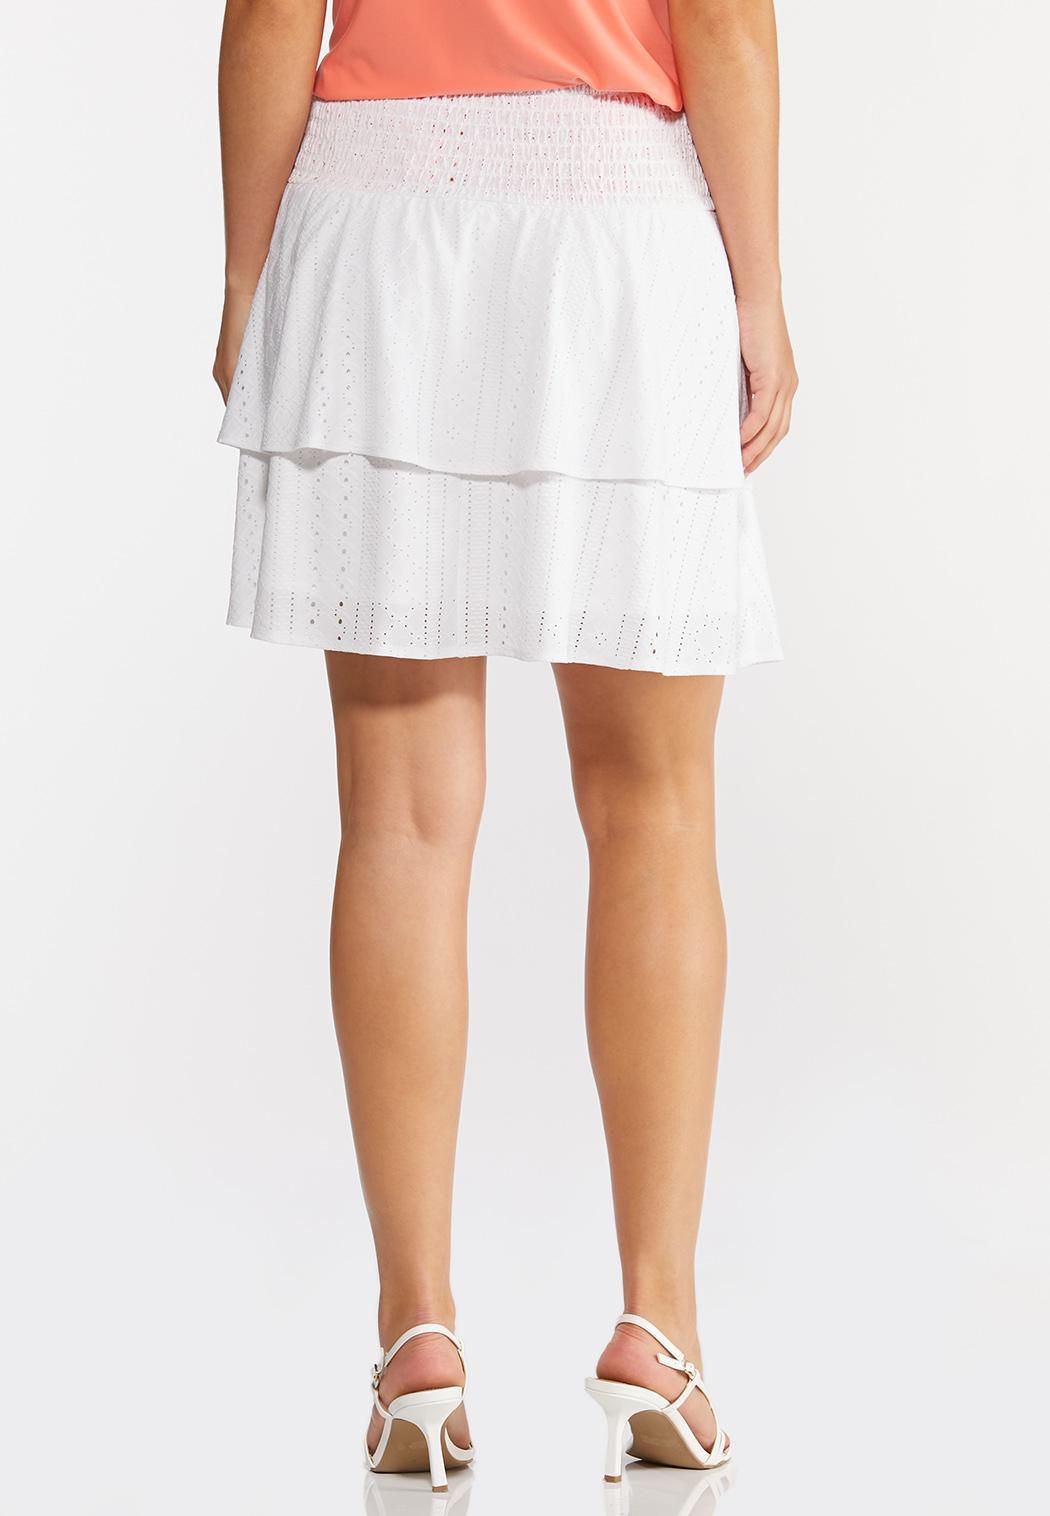 Tiered Eyelet Skirt (Item #44289026)